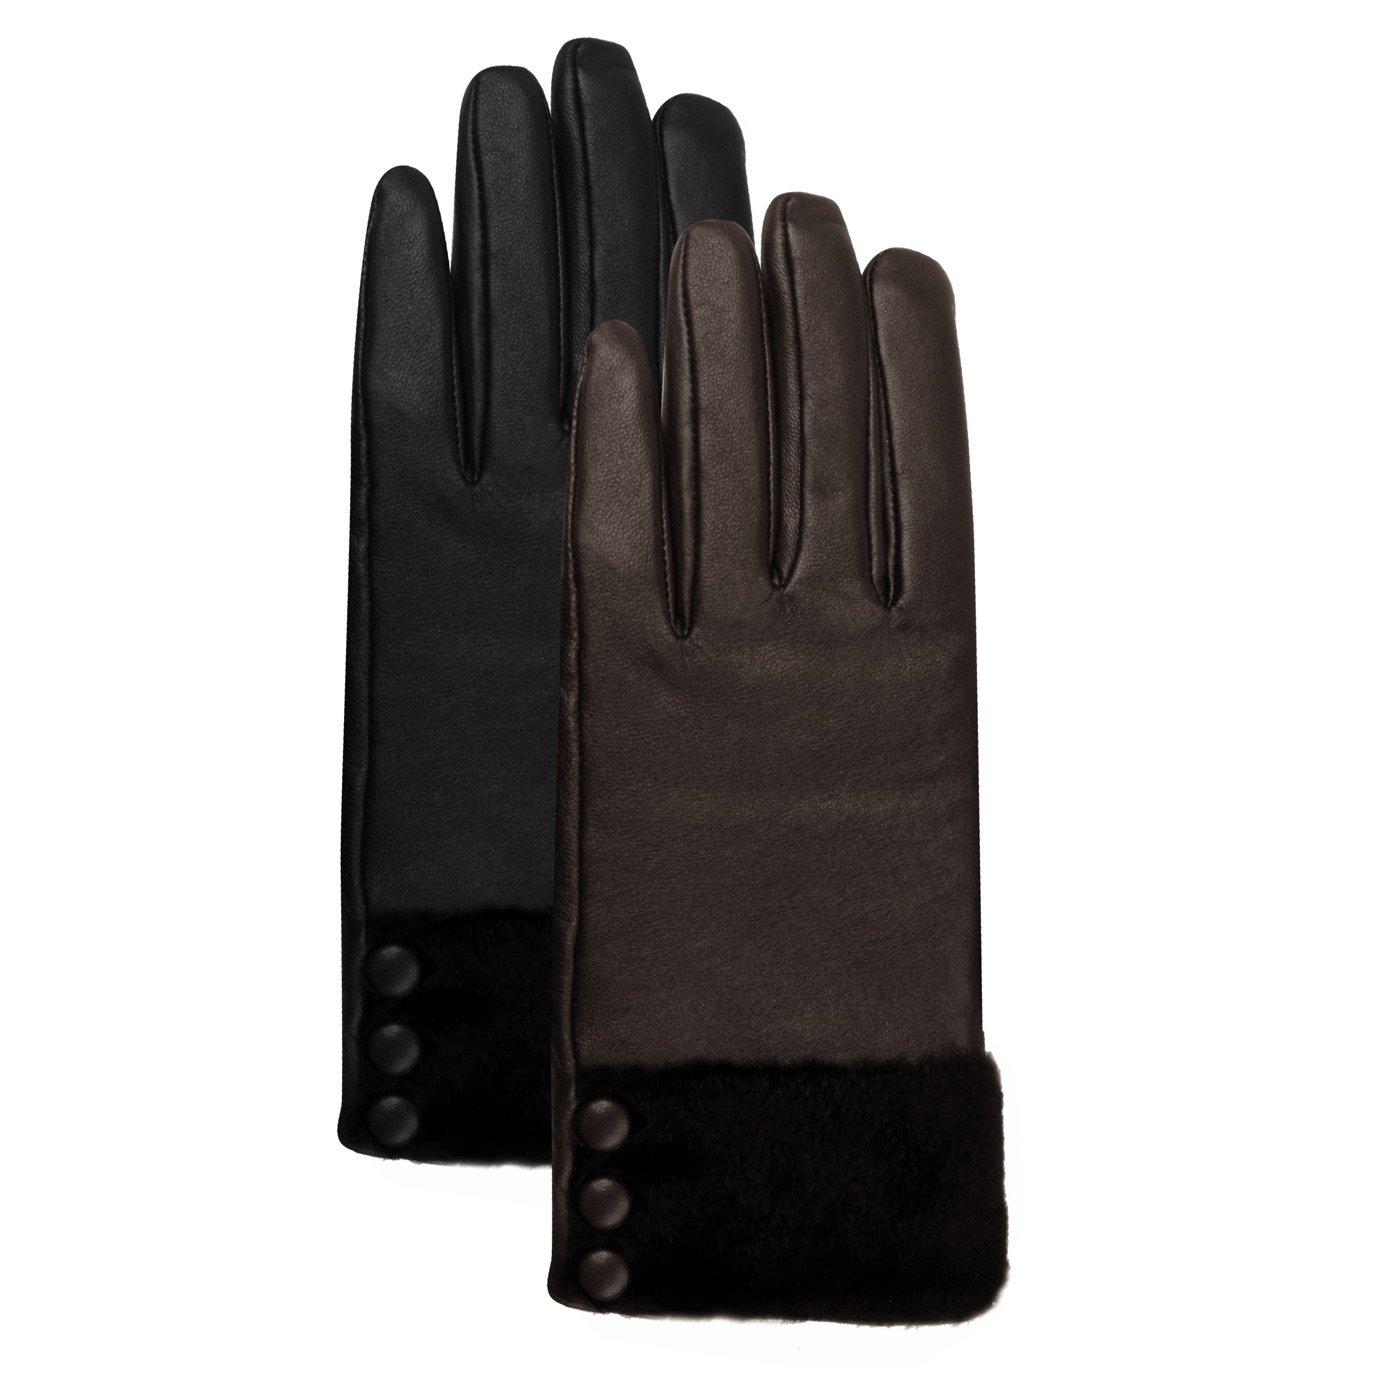 Luxury Lane Women's Fur & Button Trim Cashmere Lined Lambskin Leather Gloves - Chocolate Medium